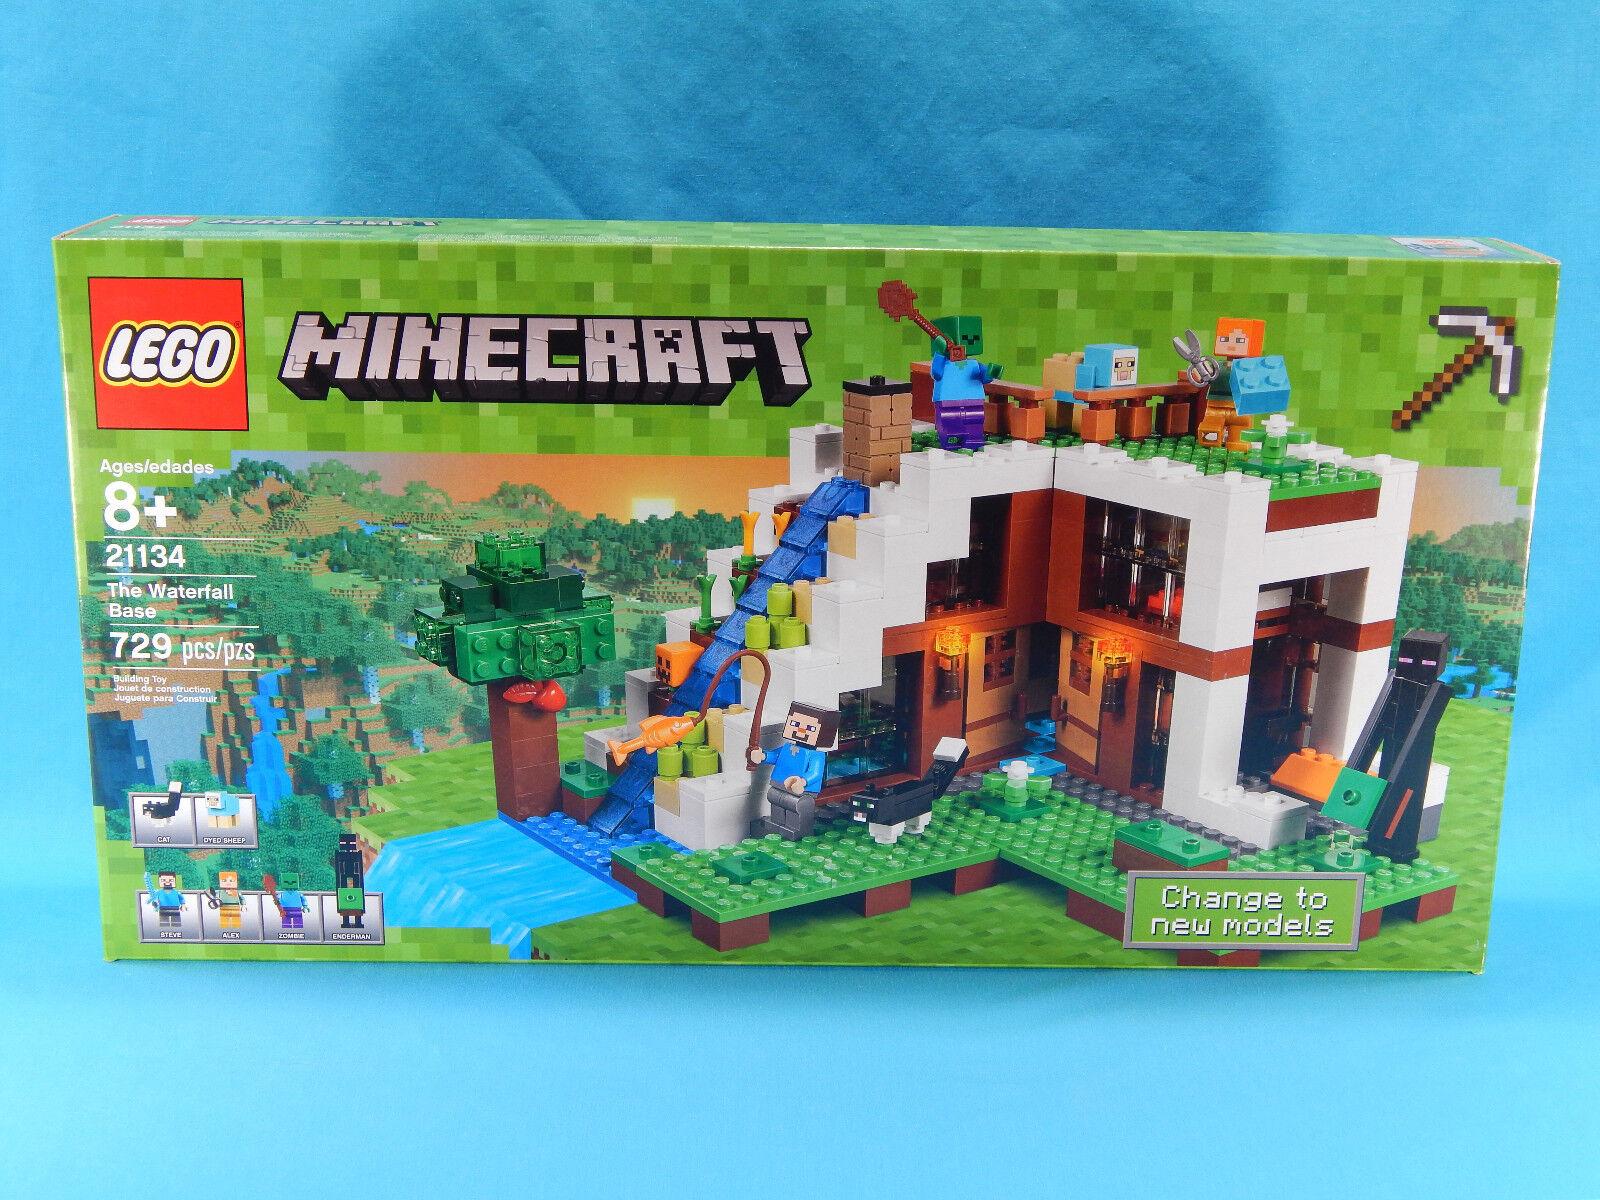 Lego Minecraft 21134 The Waterfall Base 729pcs New Sealed 2017